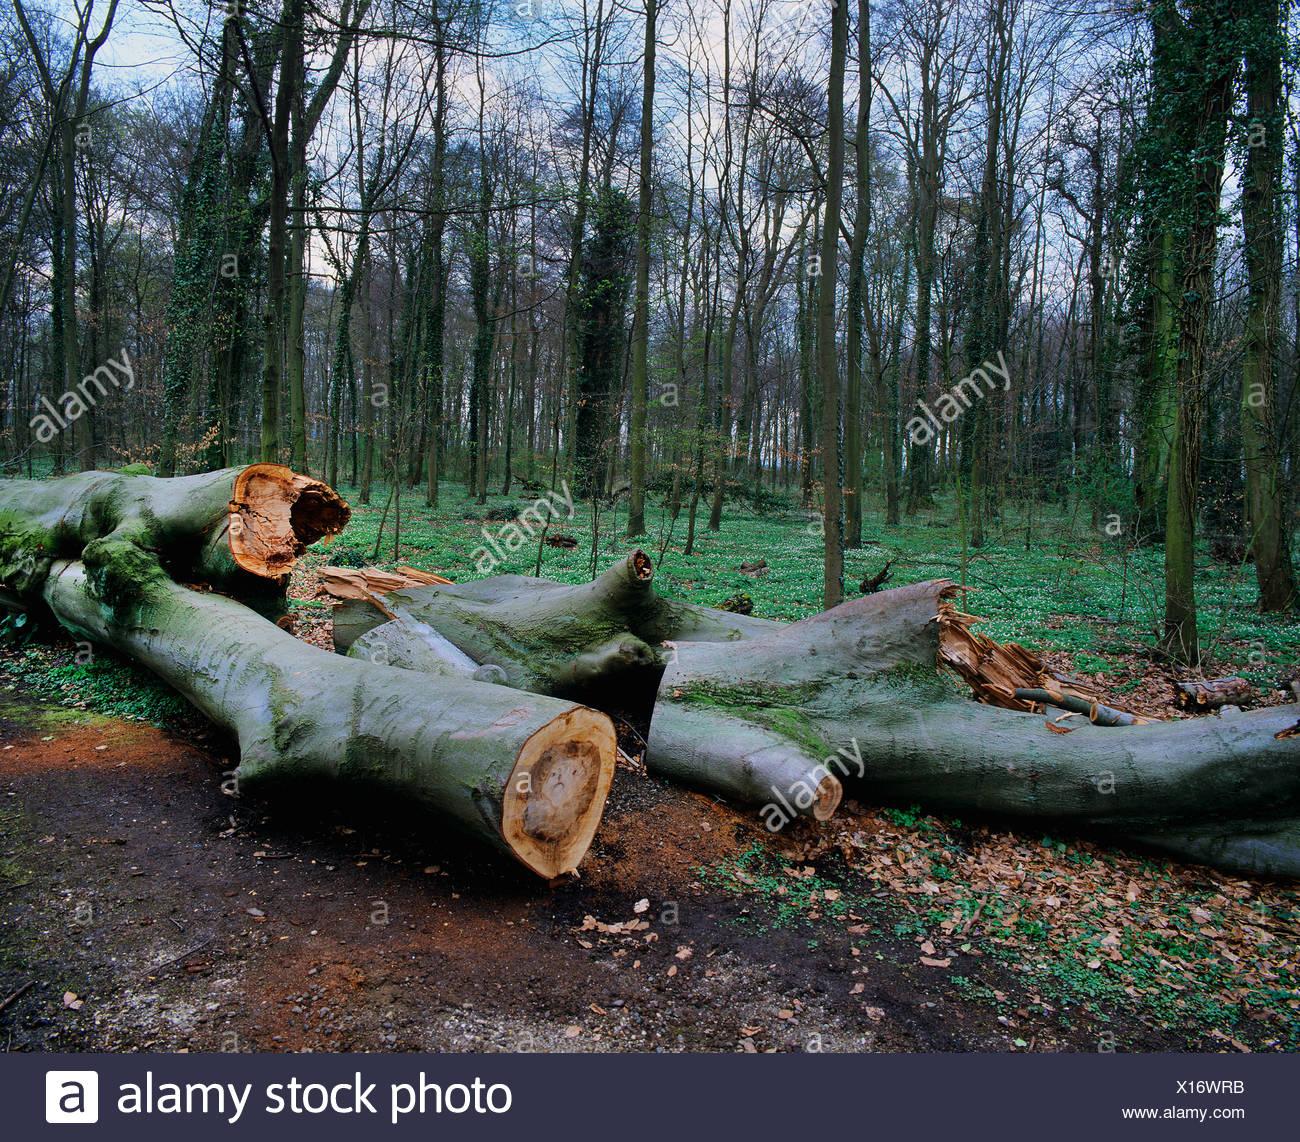 Wind breakage, cut up trunks of fallen trees, European beech, common beech (Fagus sylvatica) - Stock Image